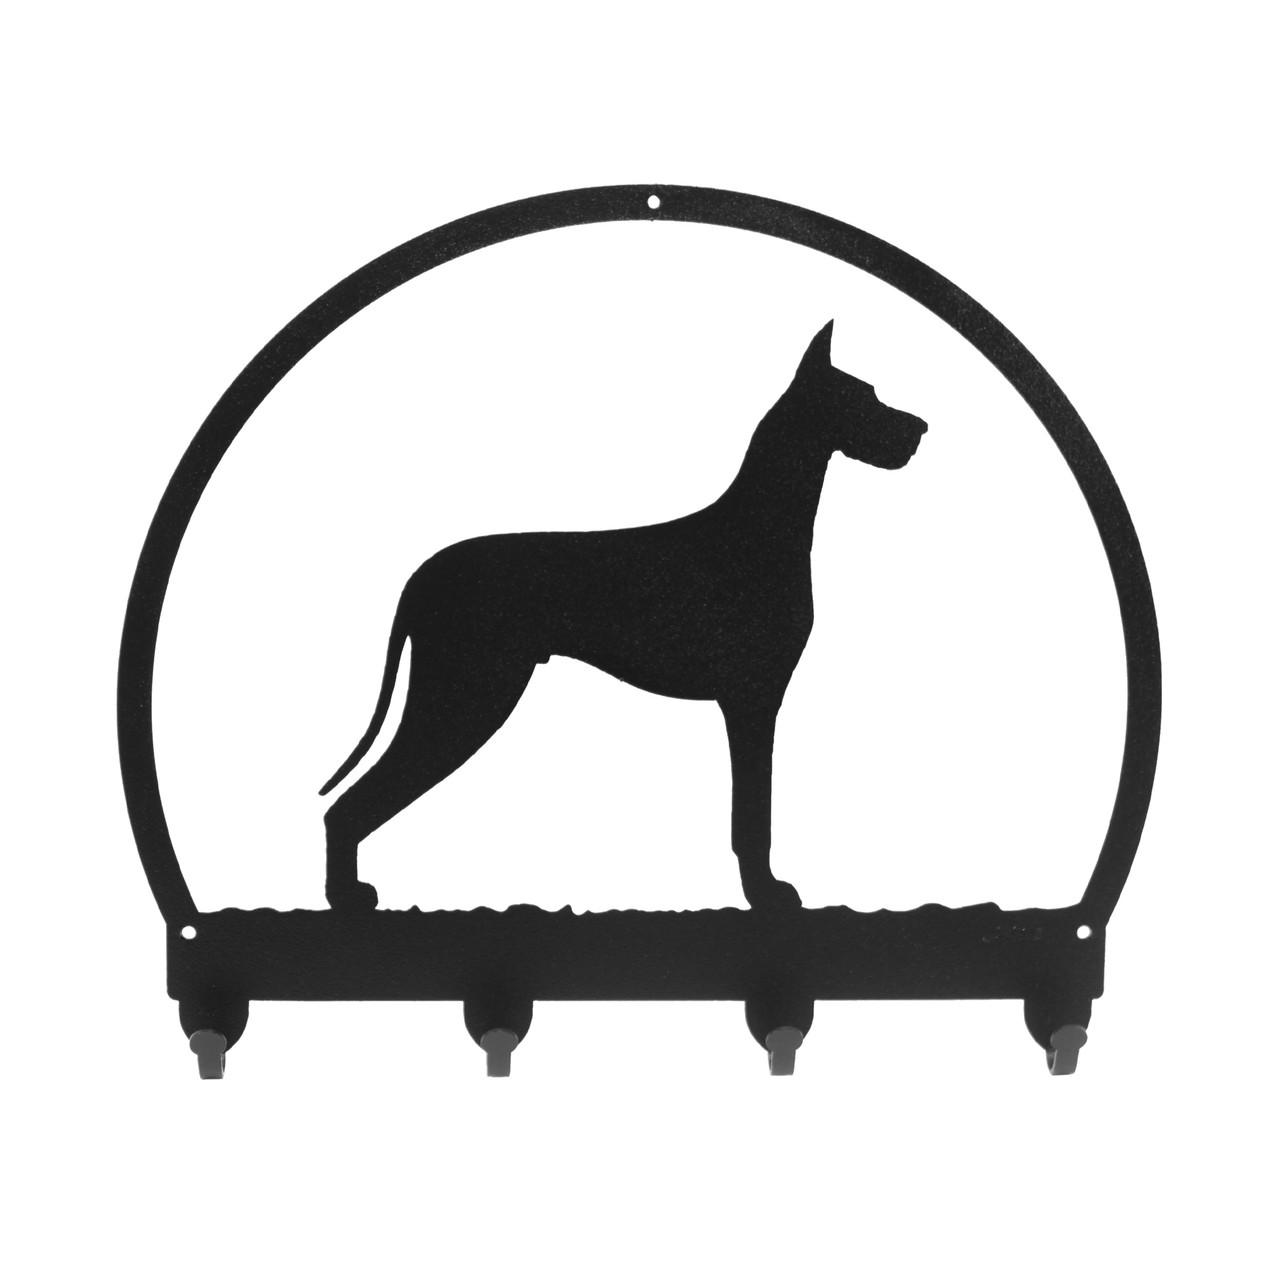 SWEN Products SCOTTISH TERRIER Dog Black Metal Key Chain Holder Hanger